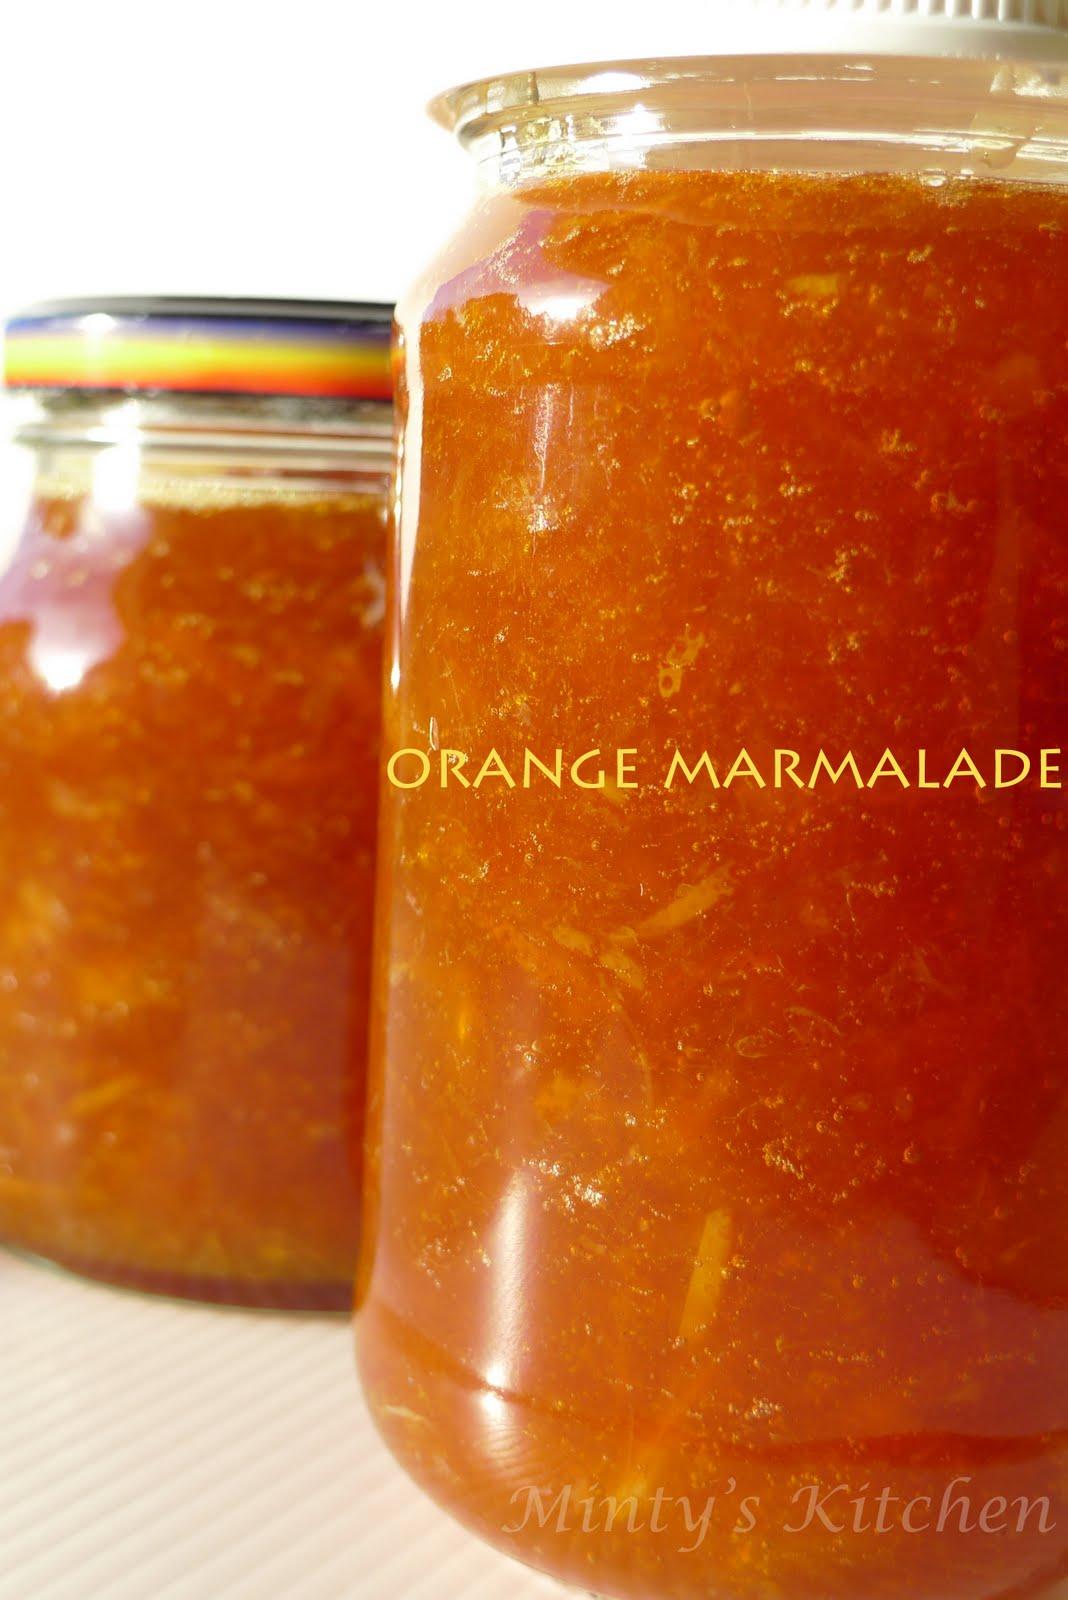 Minty's Kitchen: Orange Marmalade